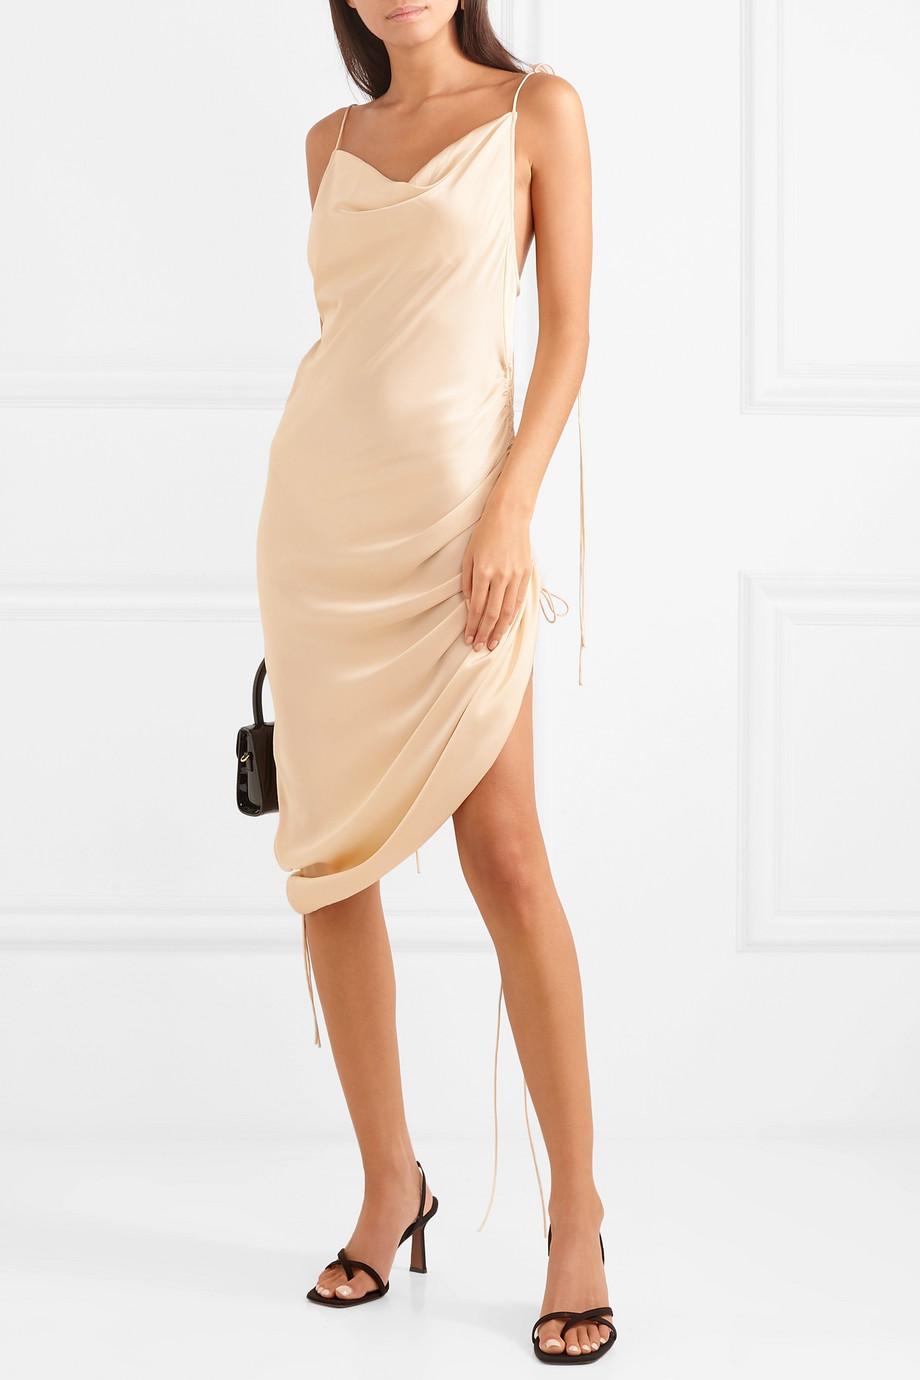 ORSEUND IRIS - Draw String Dress£635 GBP